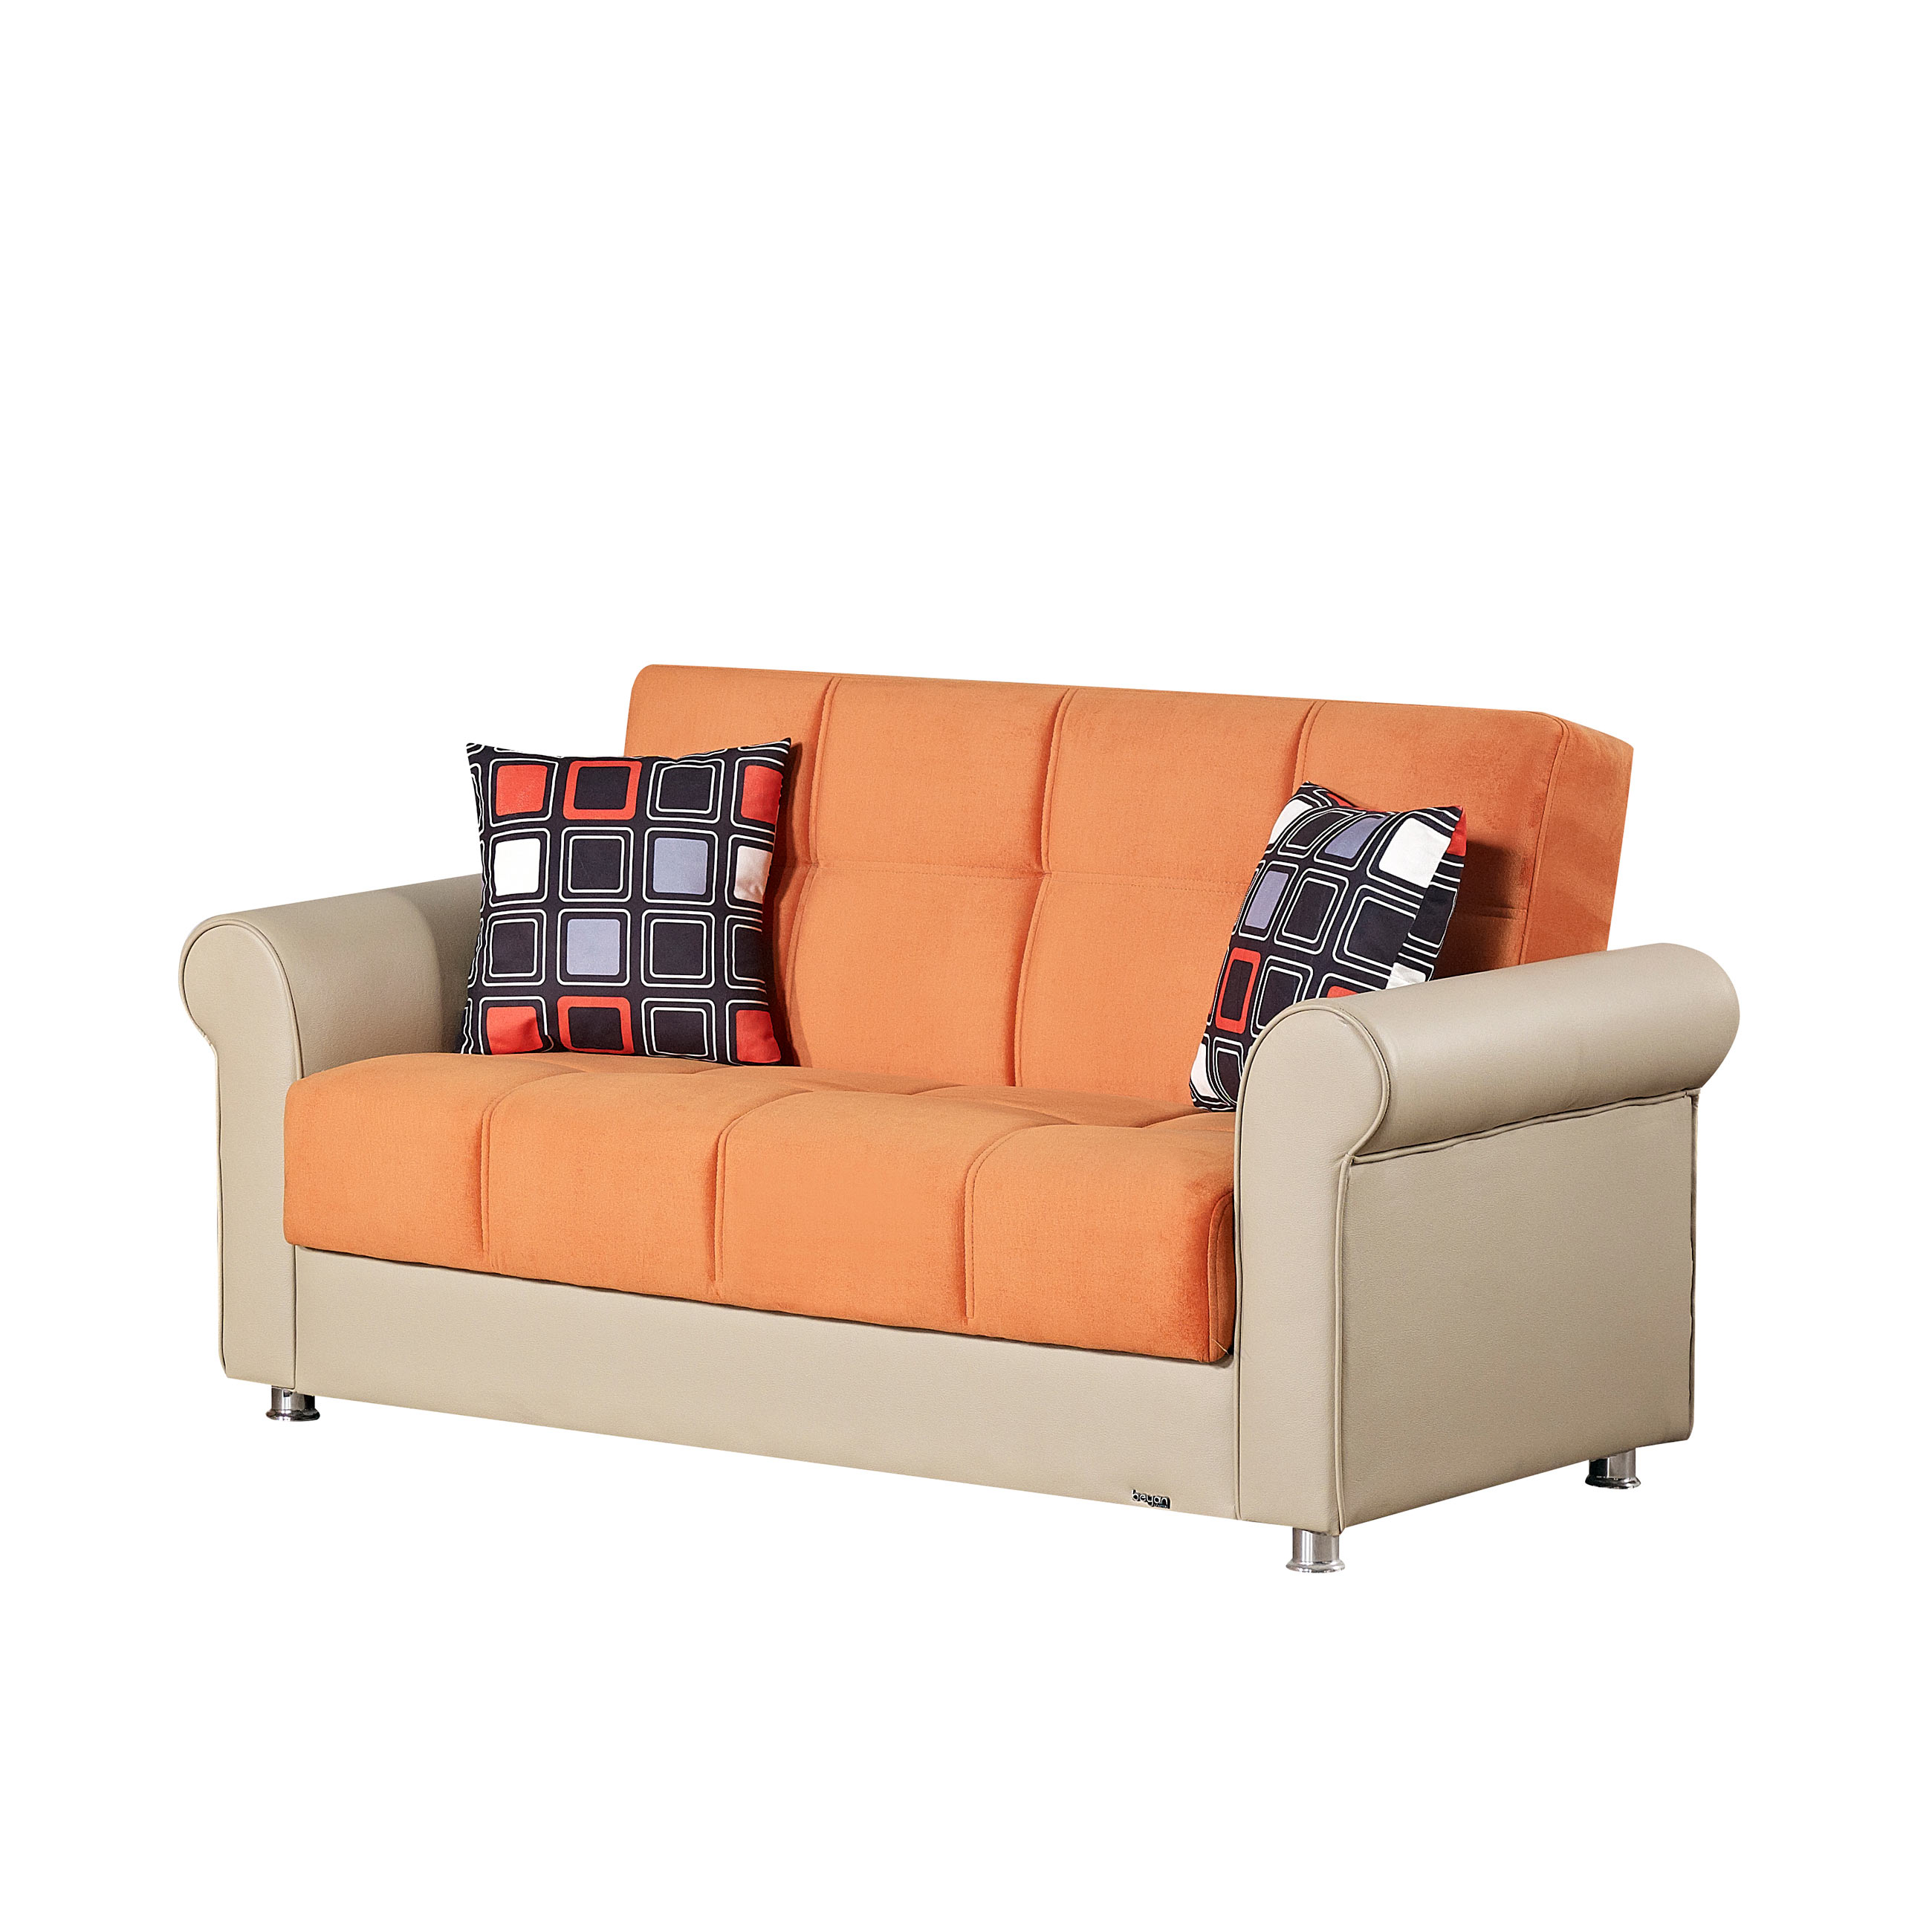 Pacific Orange Fabric Loveseat By Empire Furniture USA